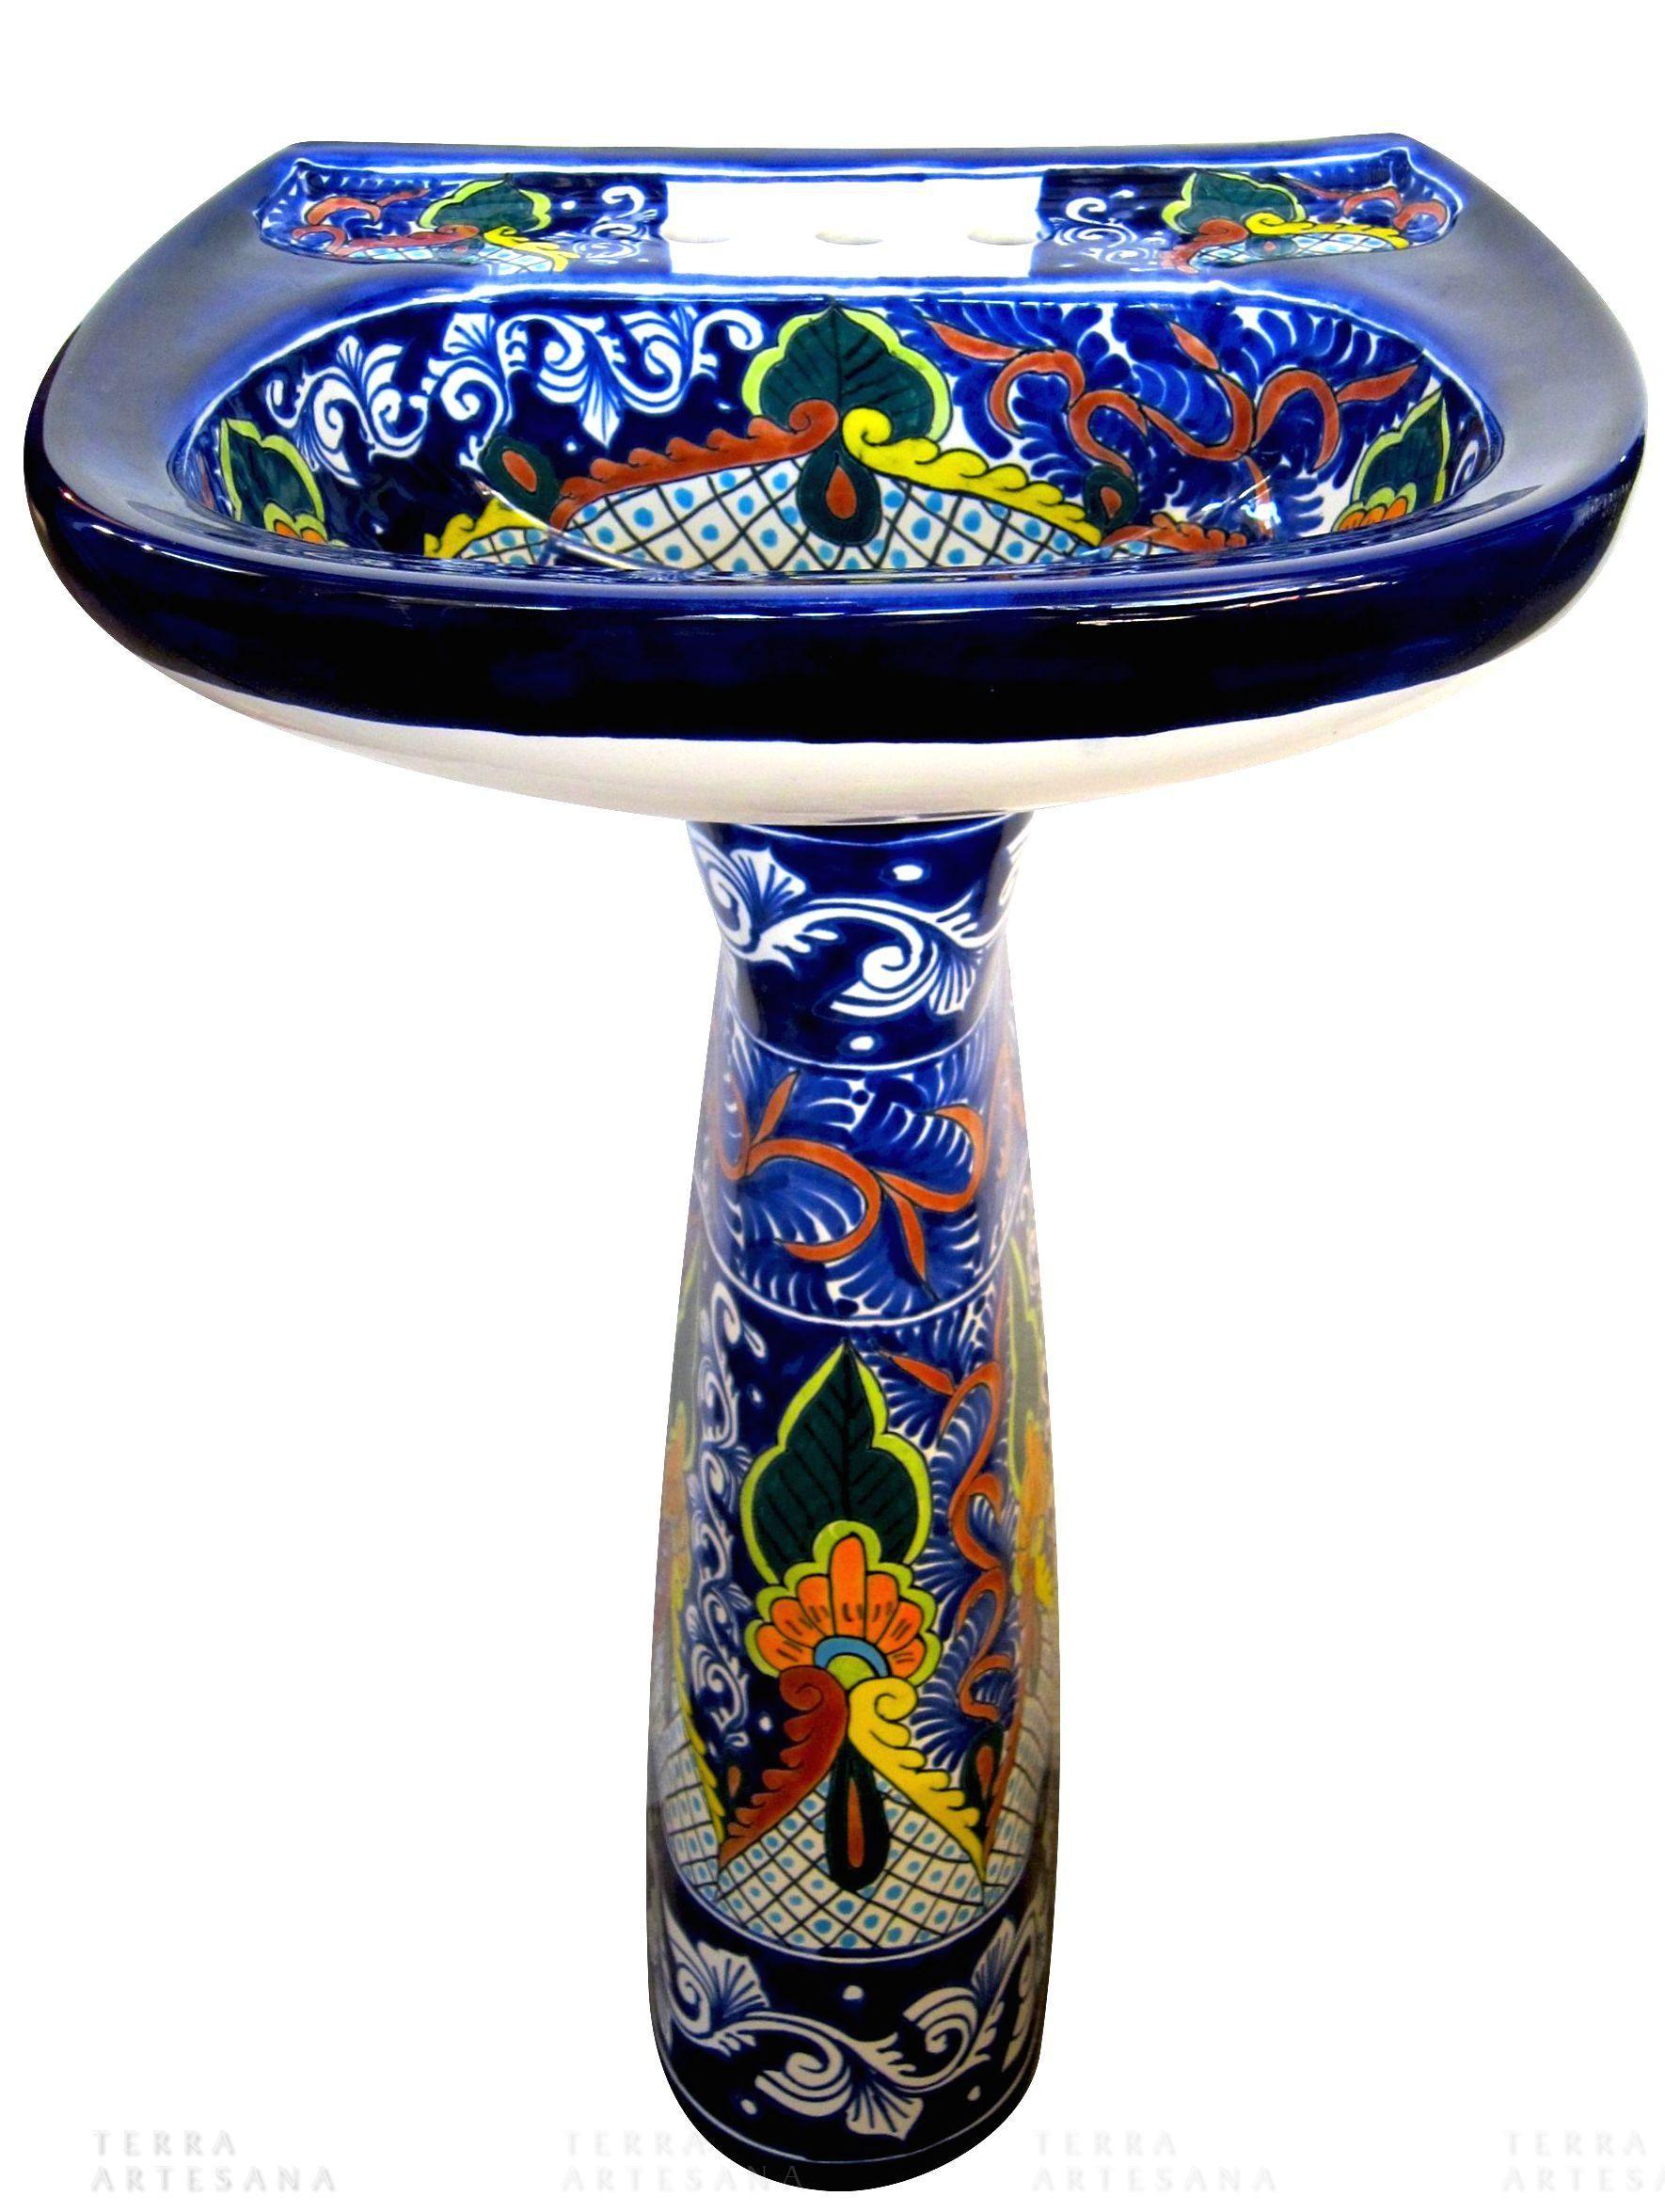 Puebla A Mexican Talavera Hand Painted Pedestal Sink Artist Unknown